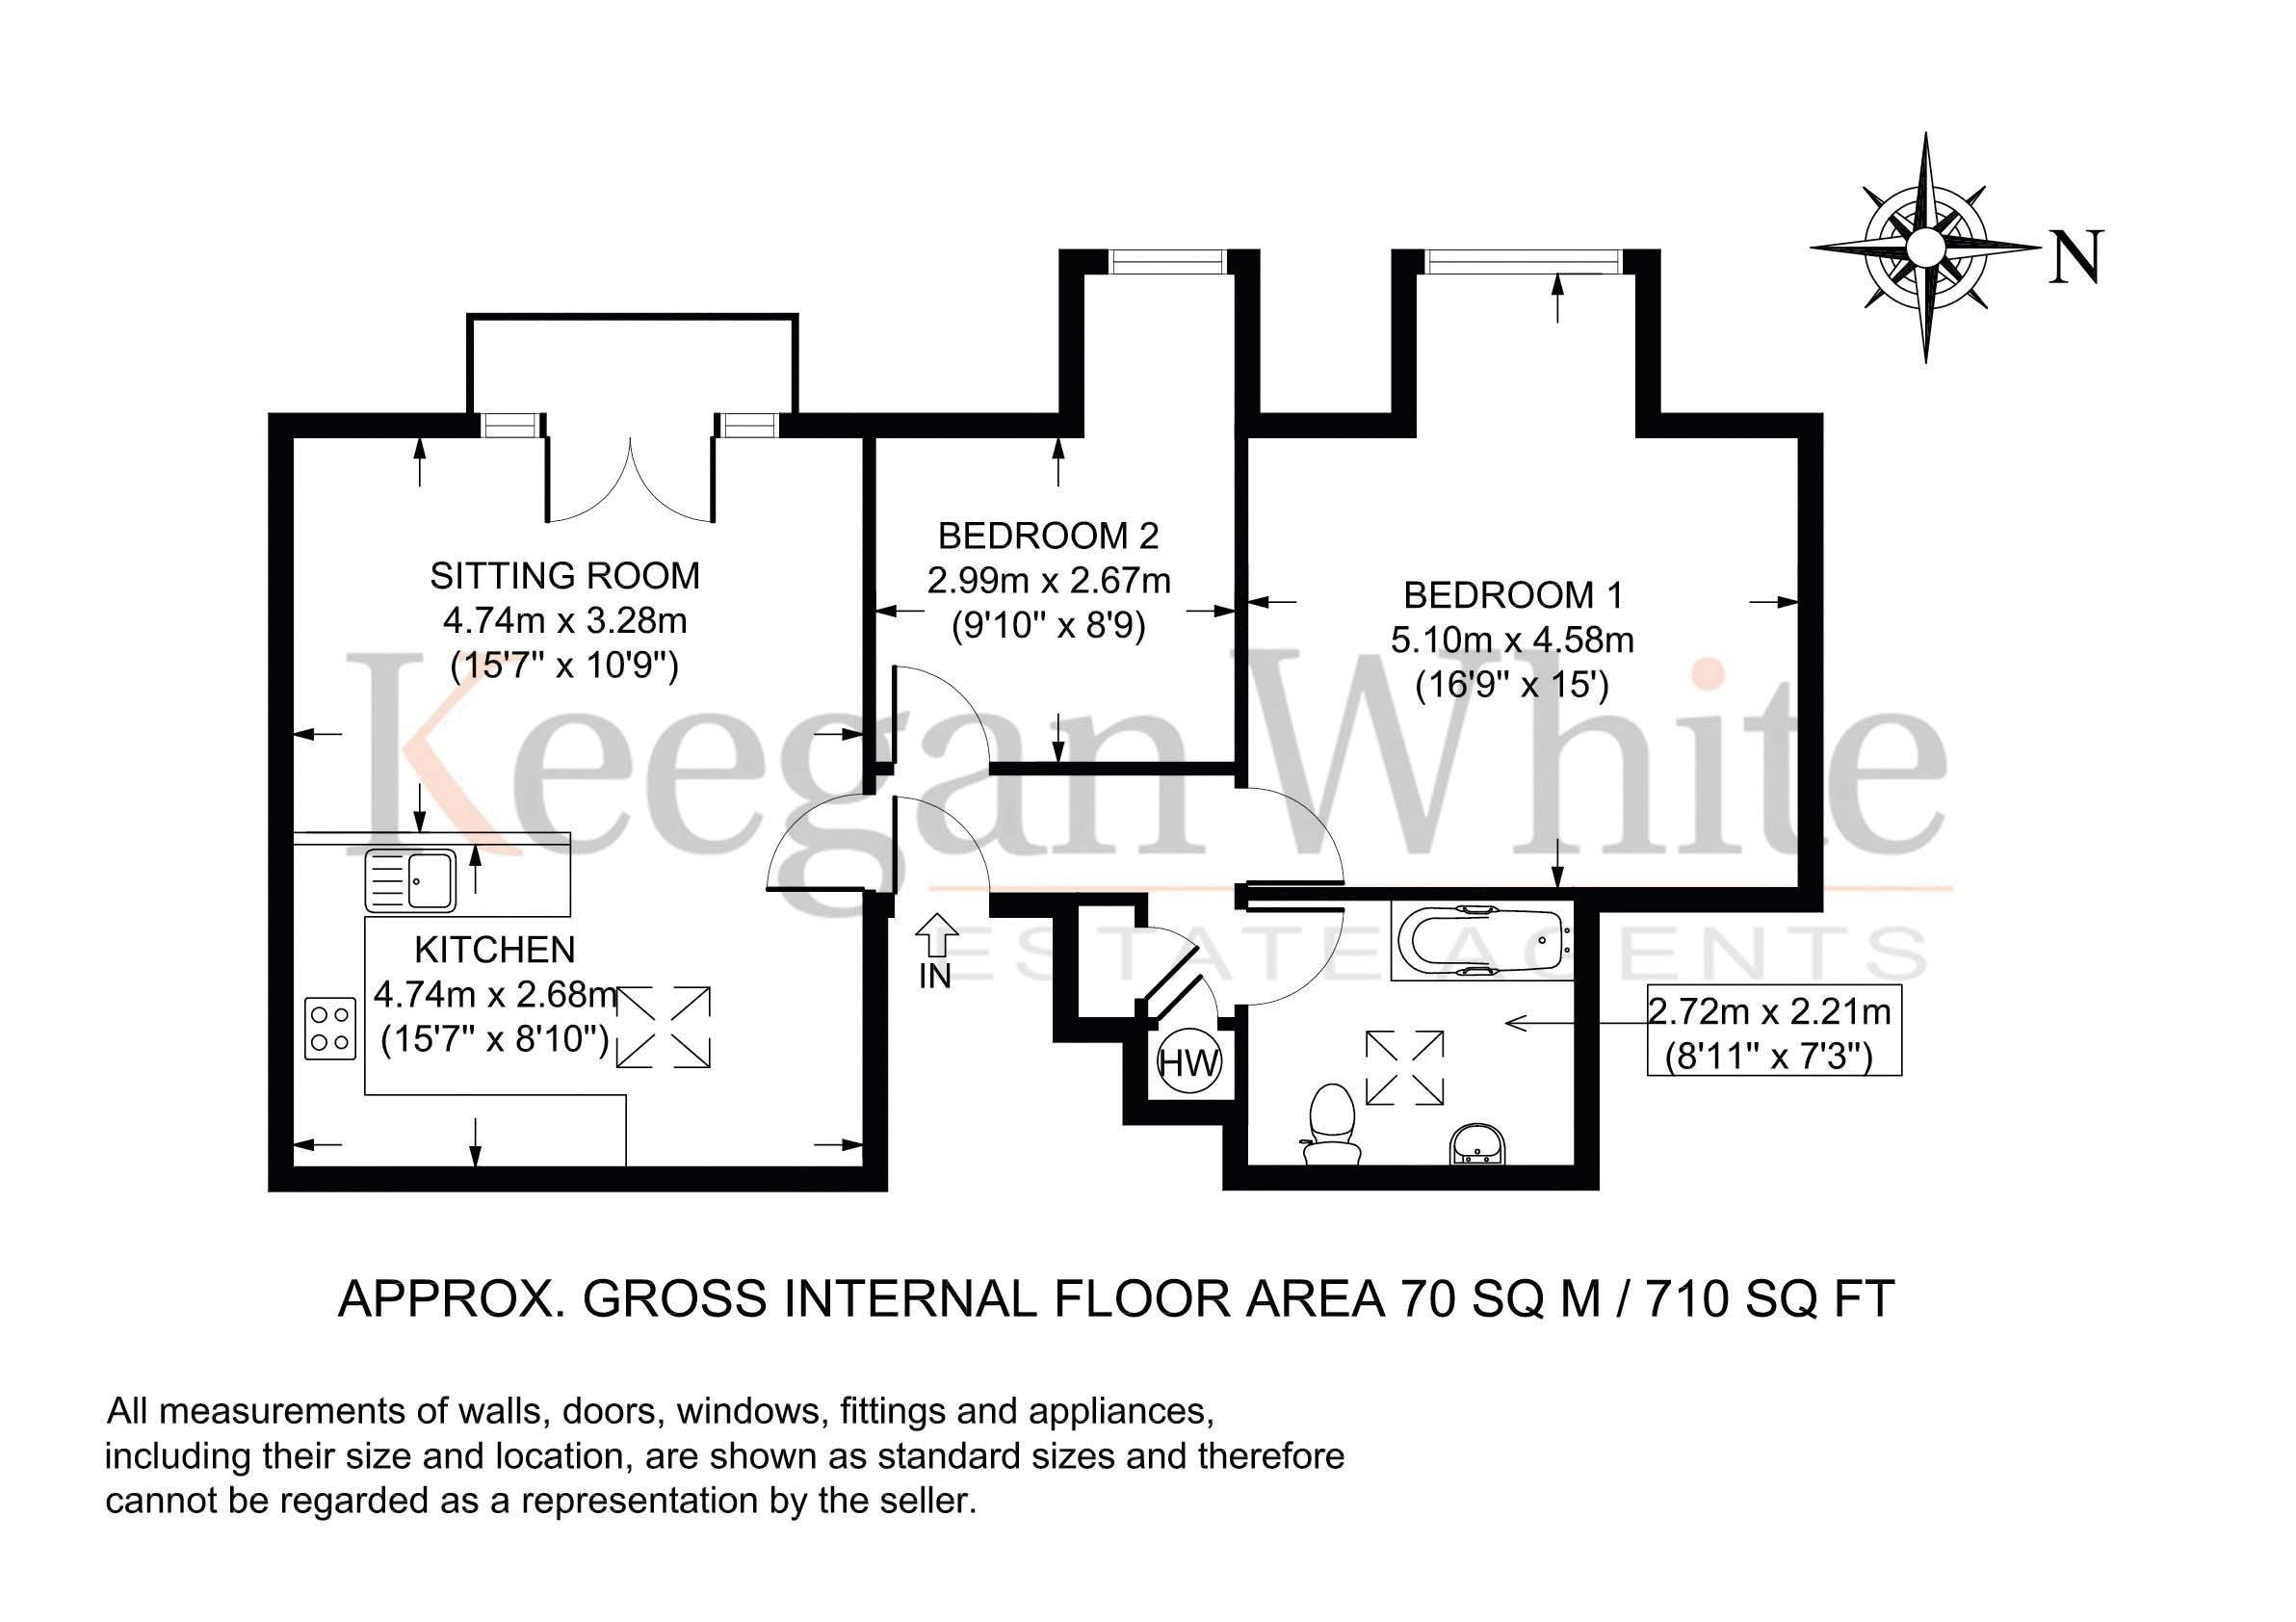 Keegan White - Floorplan - 44 Aspen Court, High Wy